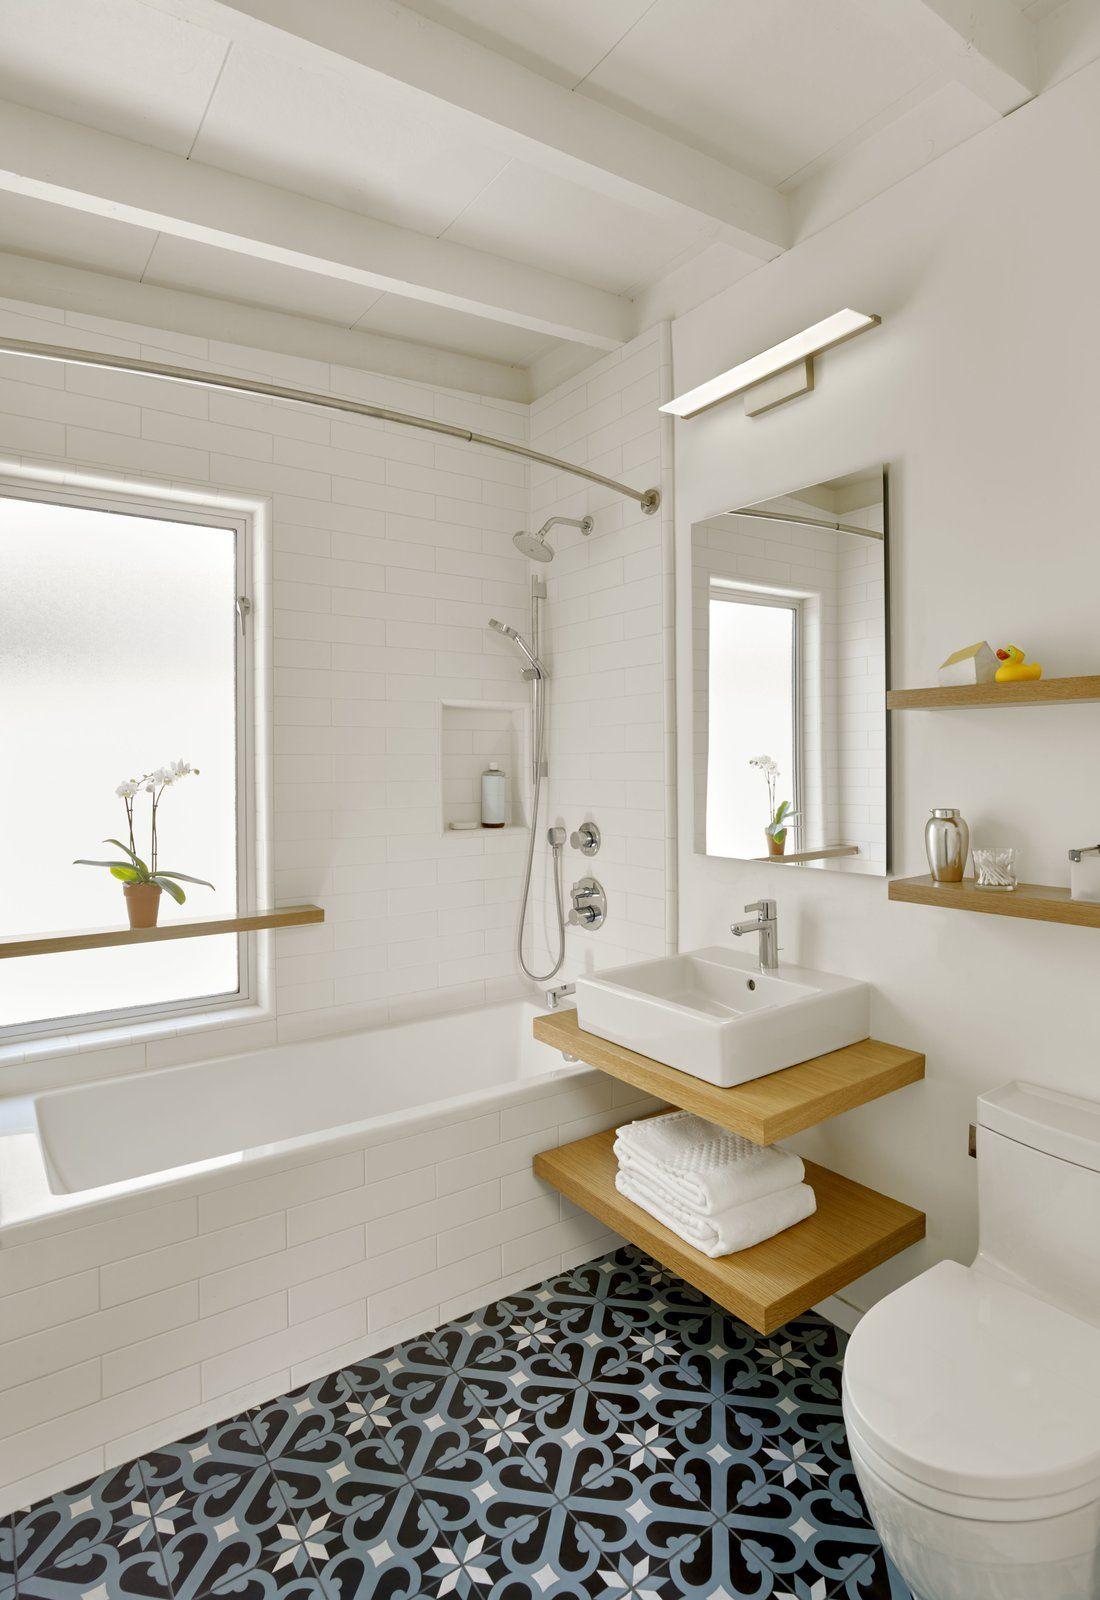 Bath Room, Wall Lighting, Concrete Floor, Undermount Tub, Open Shower, Ceramic